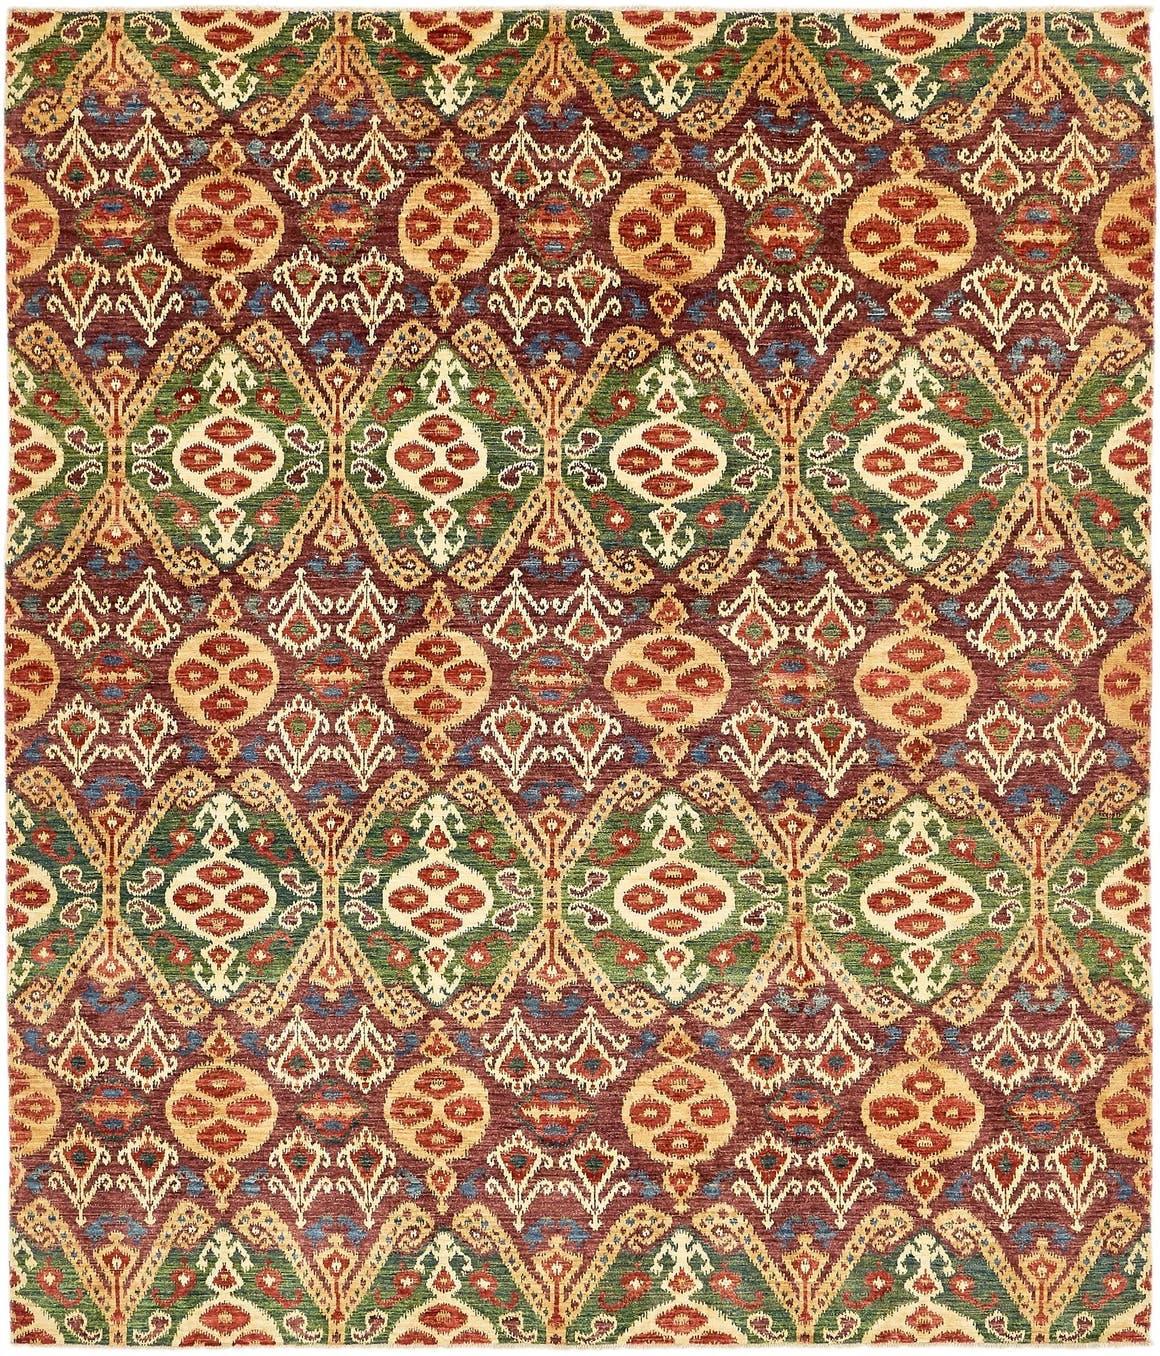 8' 3 x 9' 8 Ikat Oriental Rug main image